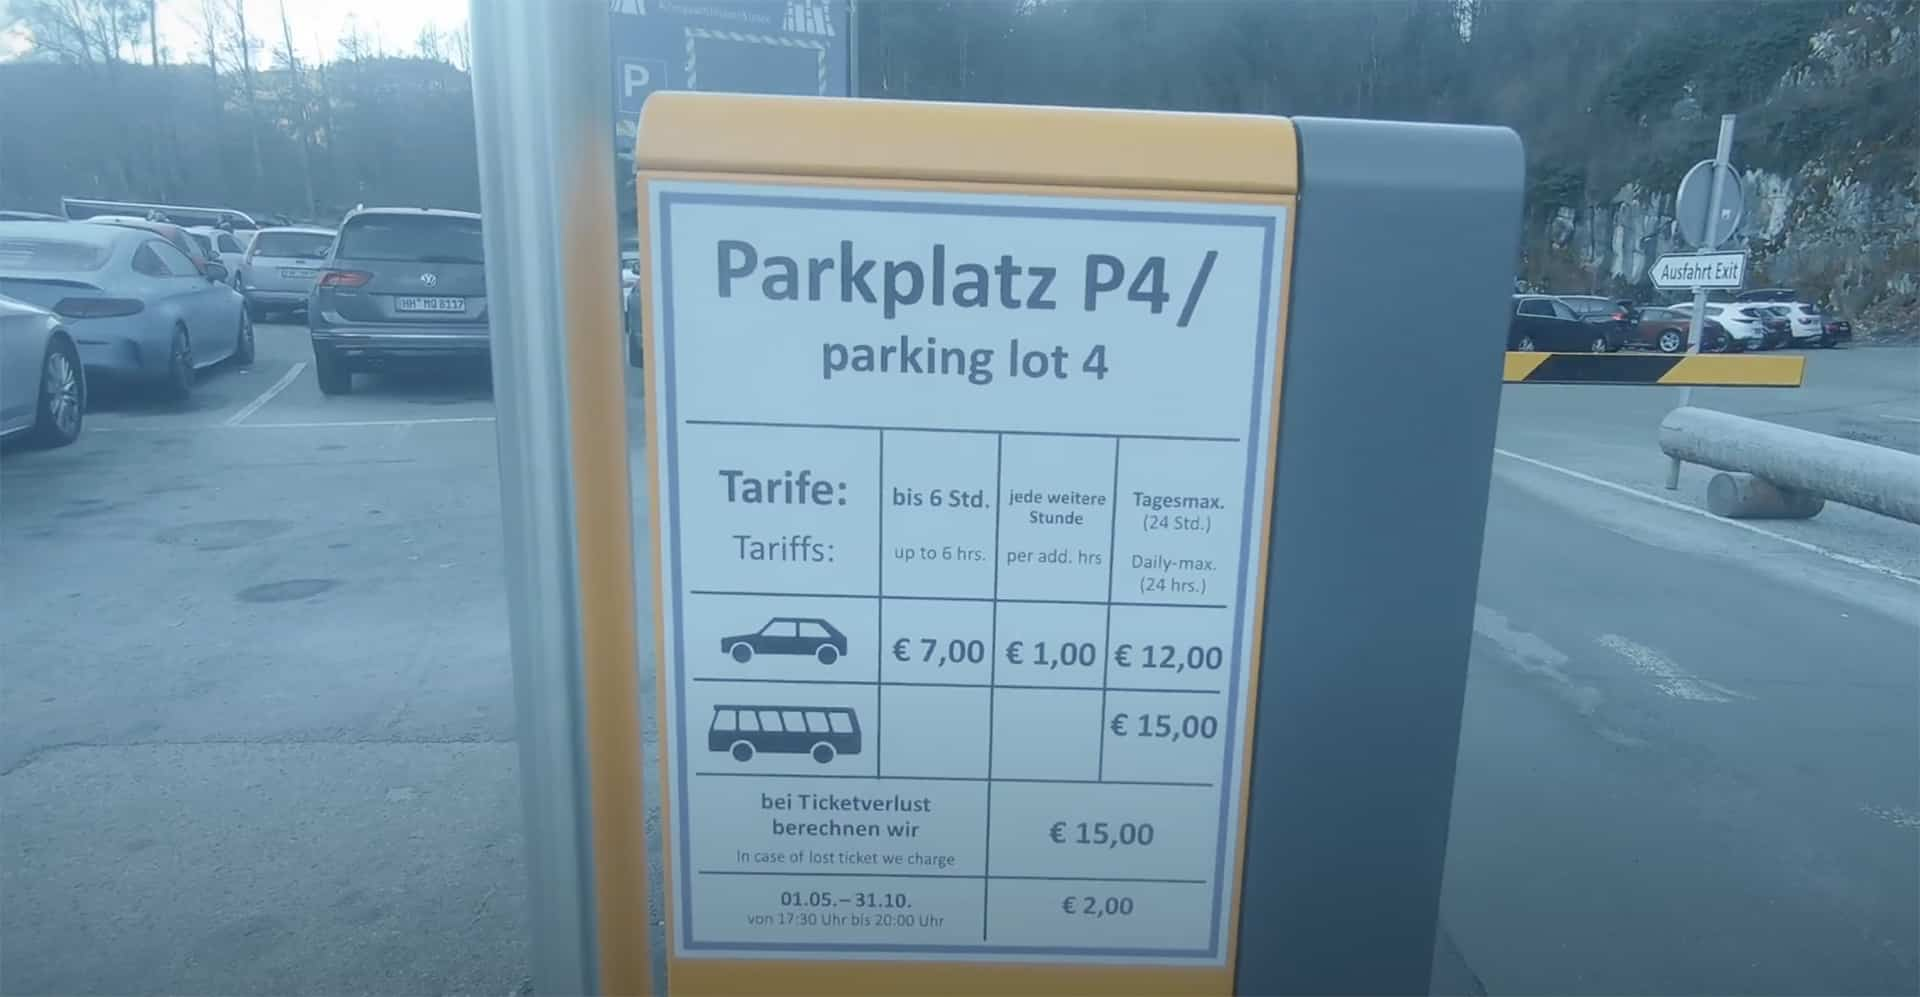 parkplatztarife hohenschwangau